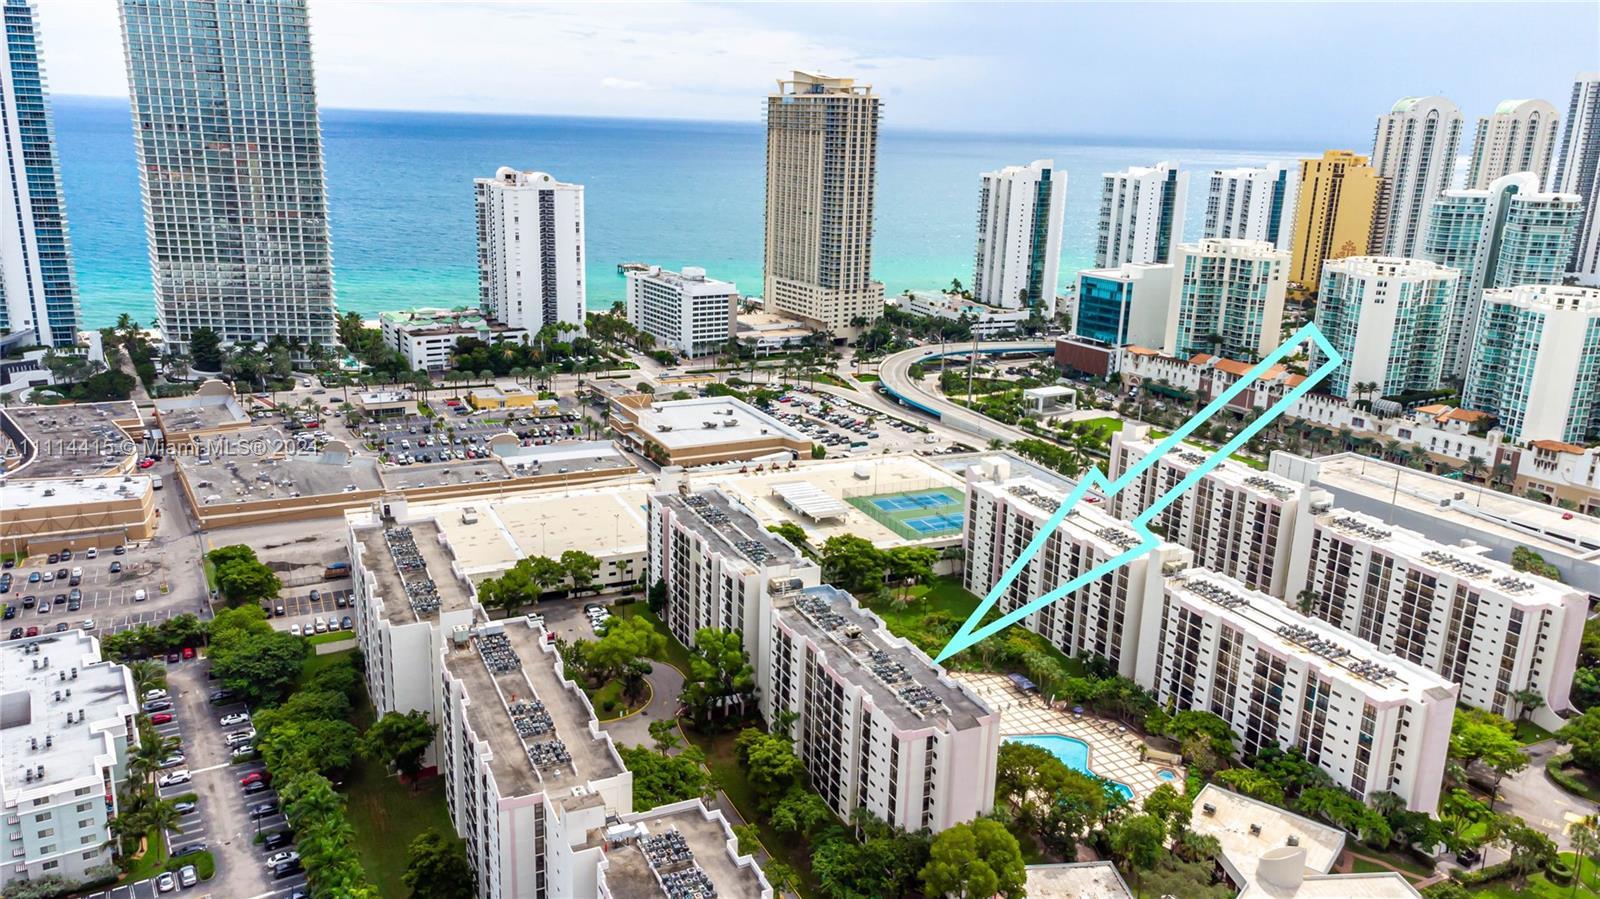 Plaza of the Americas 3 #608 - 17011 N Bay Rd #608, Sunny Isles Beach, FL 33160